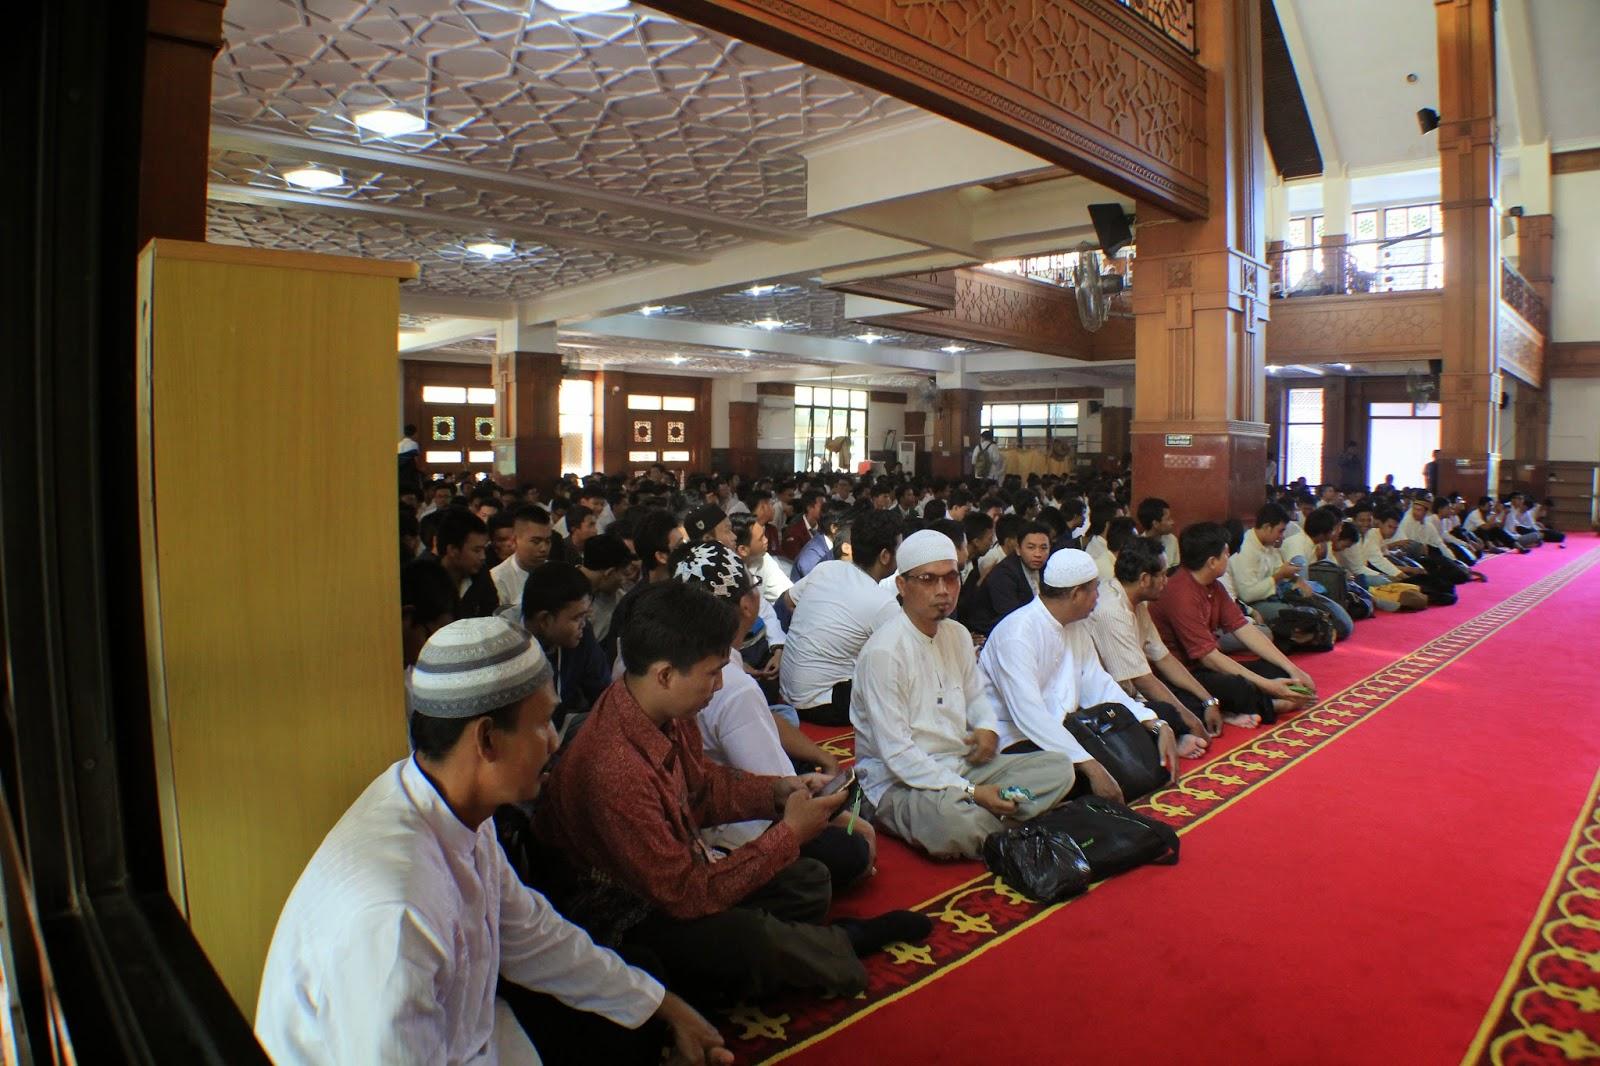 motivator islami, motivator indonesia, motivator muhasabah, trainer muhasabah, trainer islami, trainer muda, motivator termuda, motivator muda, seminar motivasi, seminar muhasabah, training motivasi, training motivasi muhasabah, pembicara motivasi, ustadz motivator